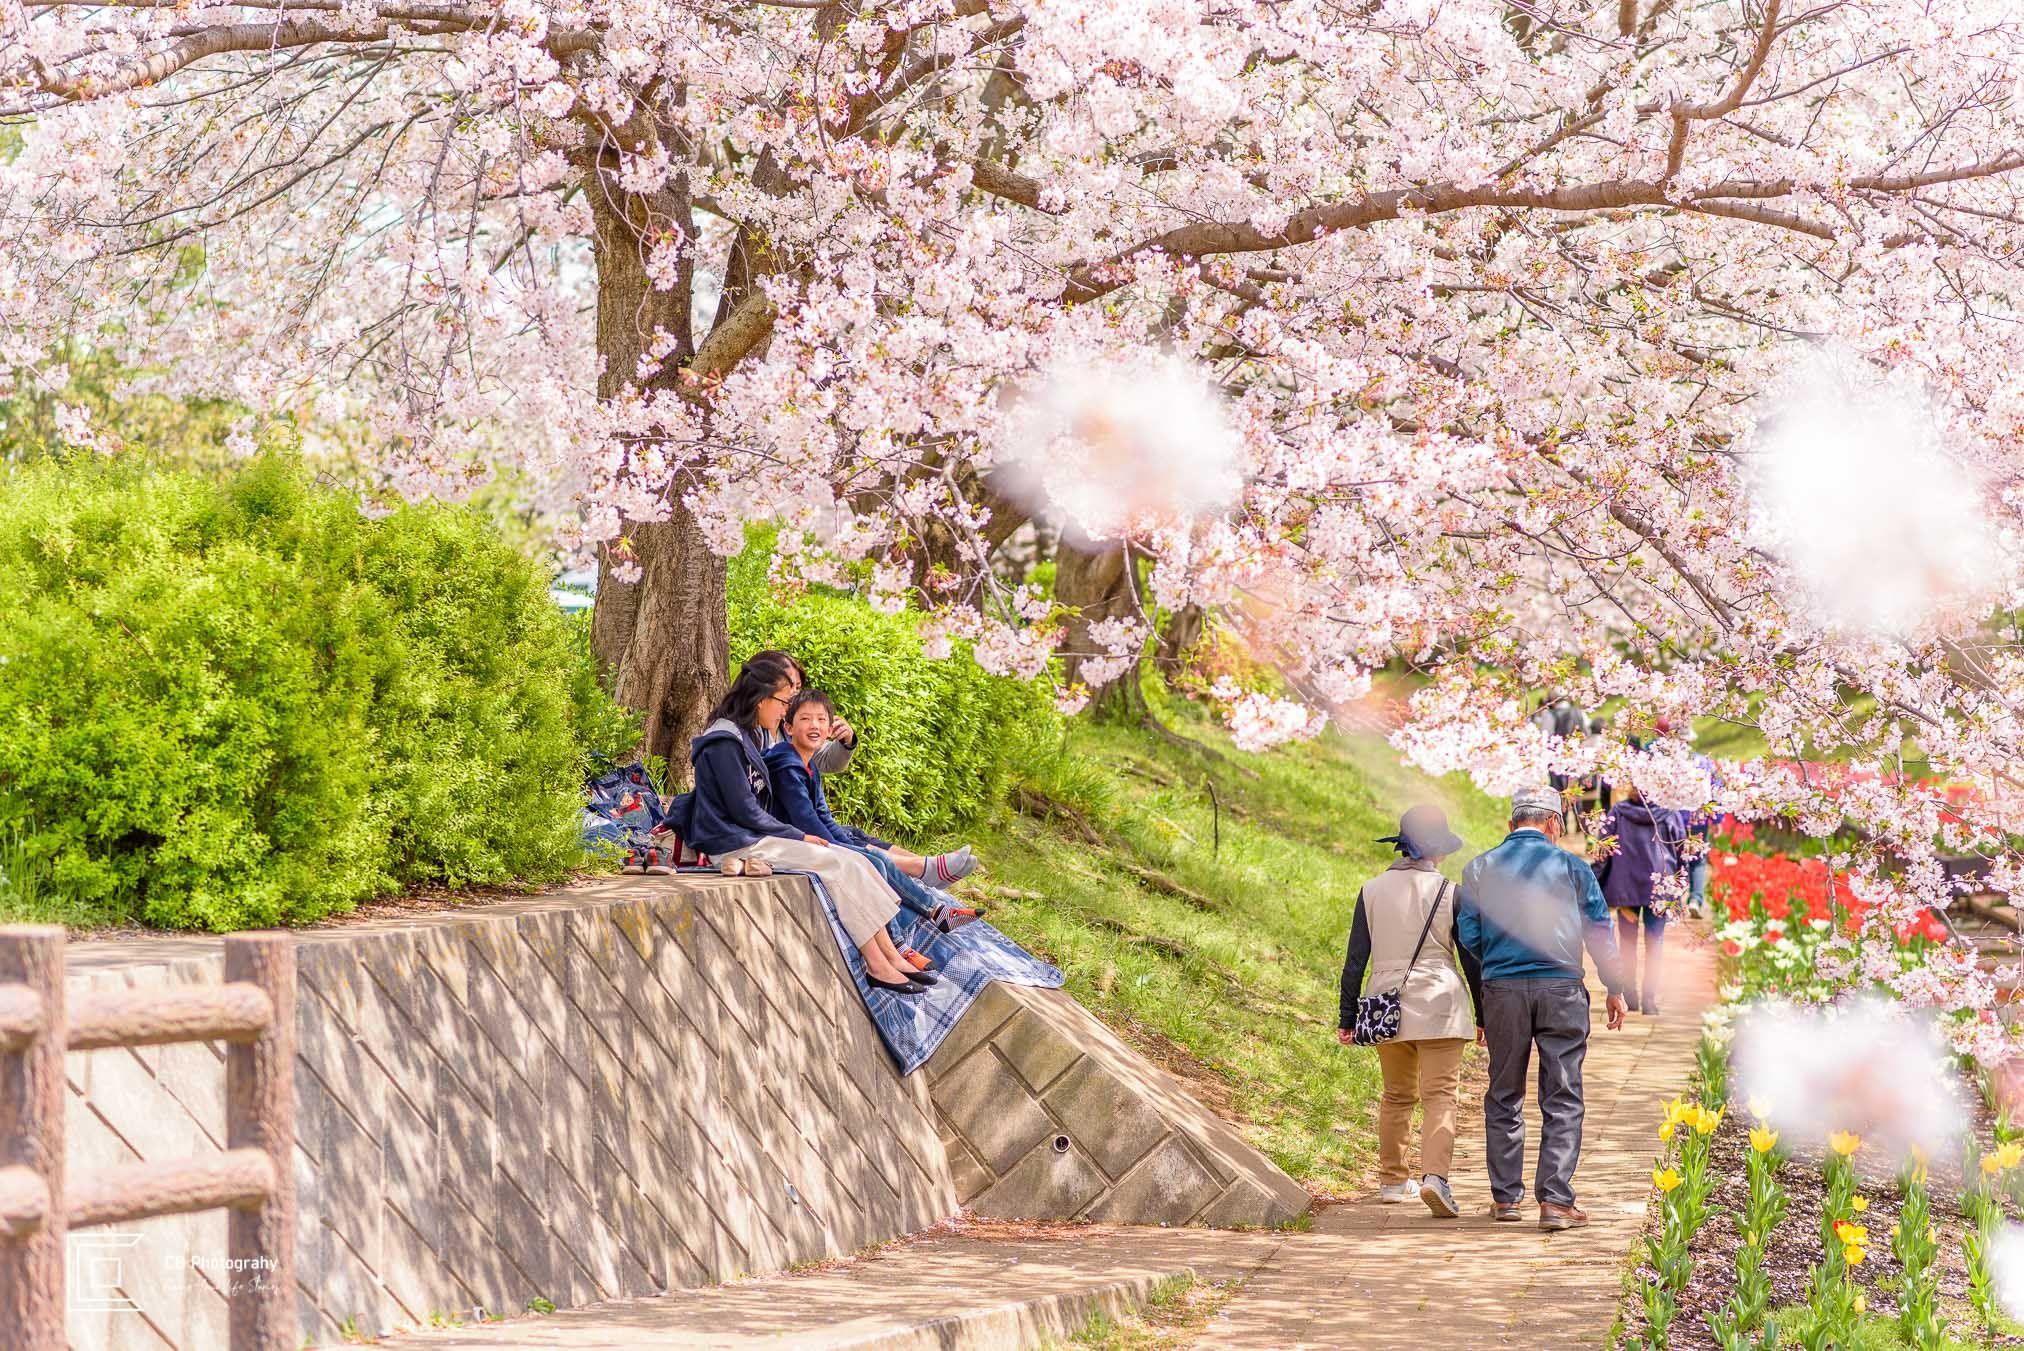 The Best Place For Sakura Photos In The Spring Of 2020 In Japan Photographer In Tokyo Metropolitan Area Photo Sakura Sakura Tree